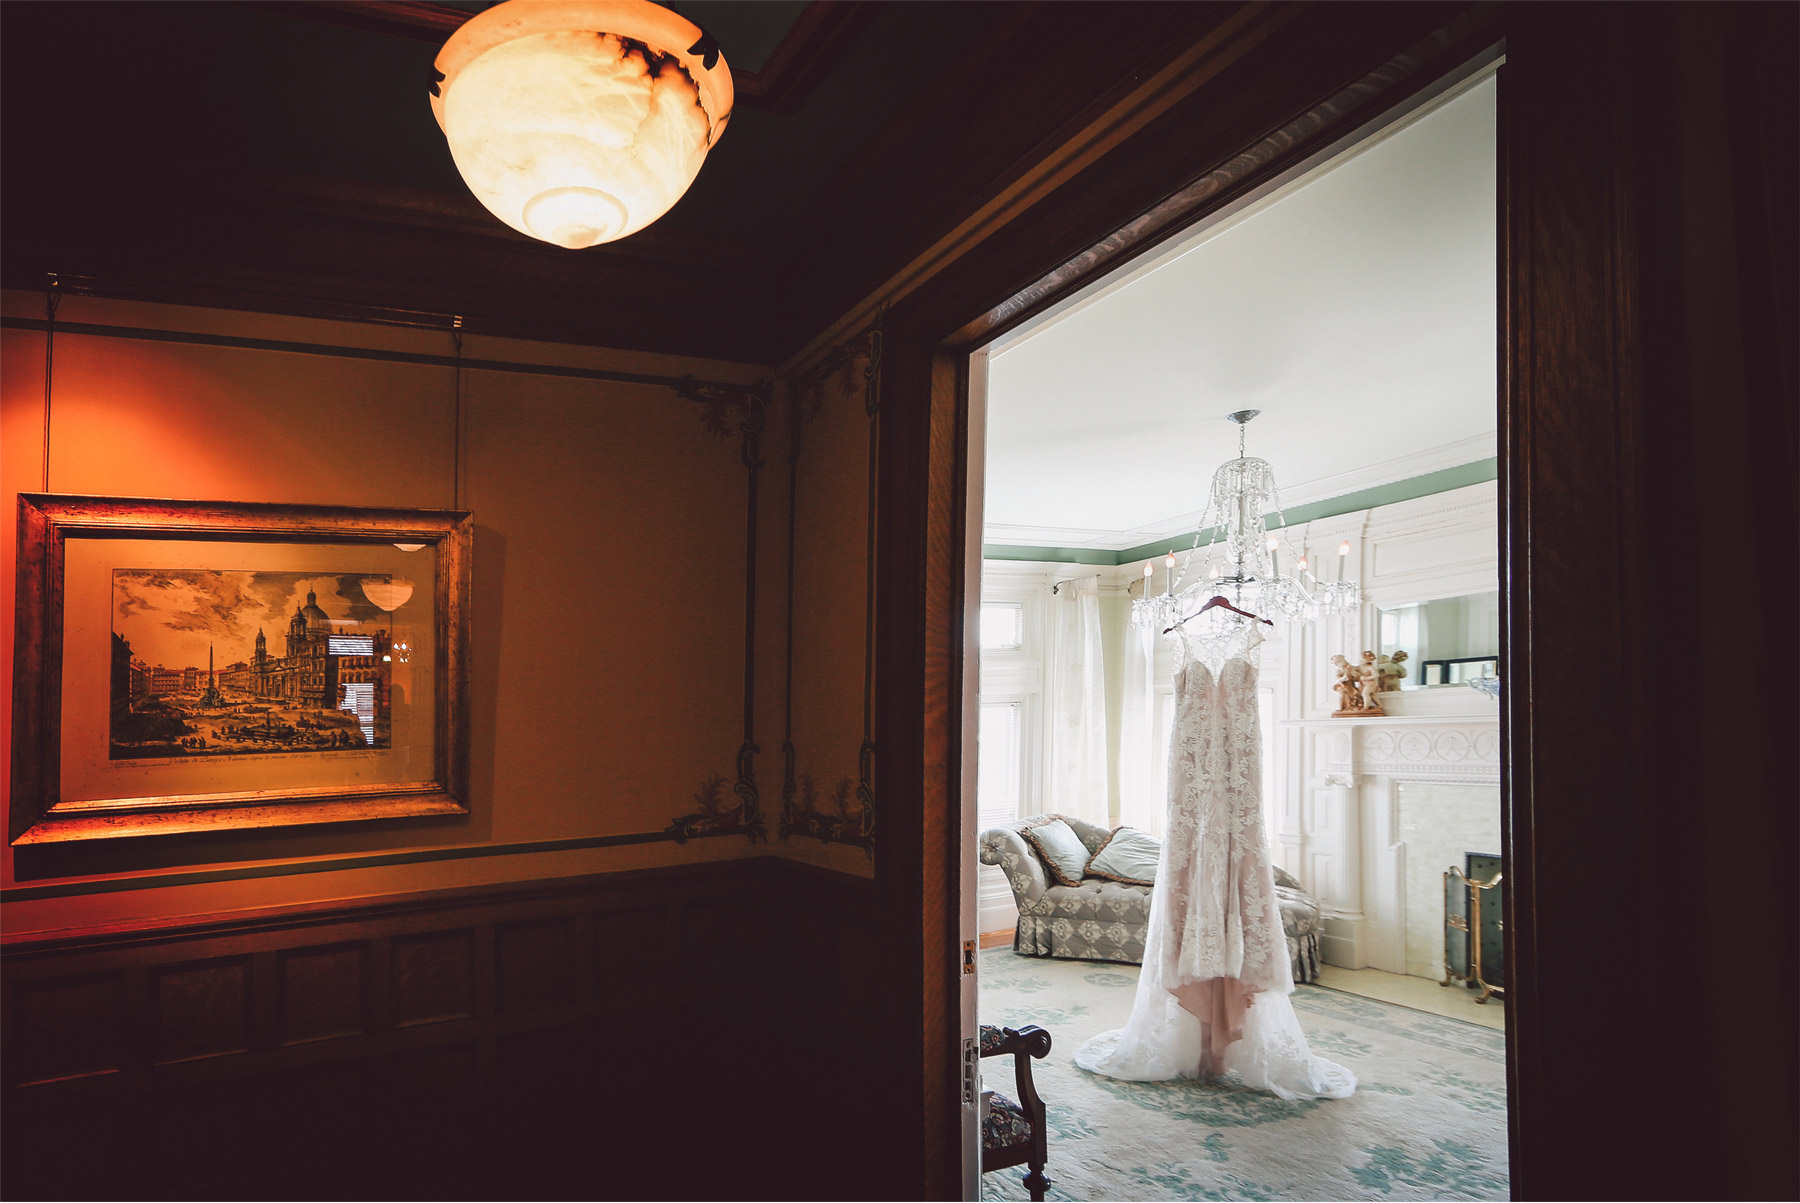 01-Minneapolis-Minnesota-Wedding-Photographer-by-Vick-Photography-Van-Dusen-Mansion-Wedding-Dress-Getting-Ready-Megan-and-Ned.jpg